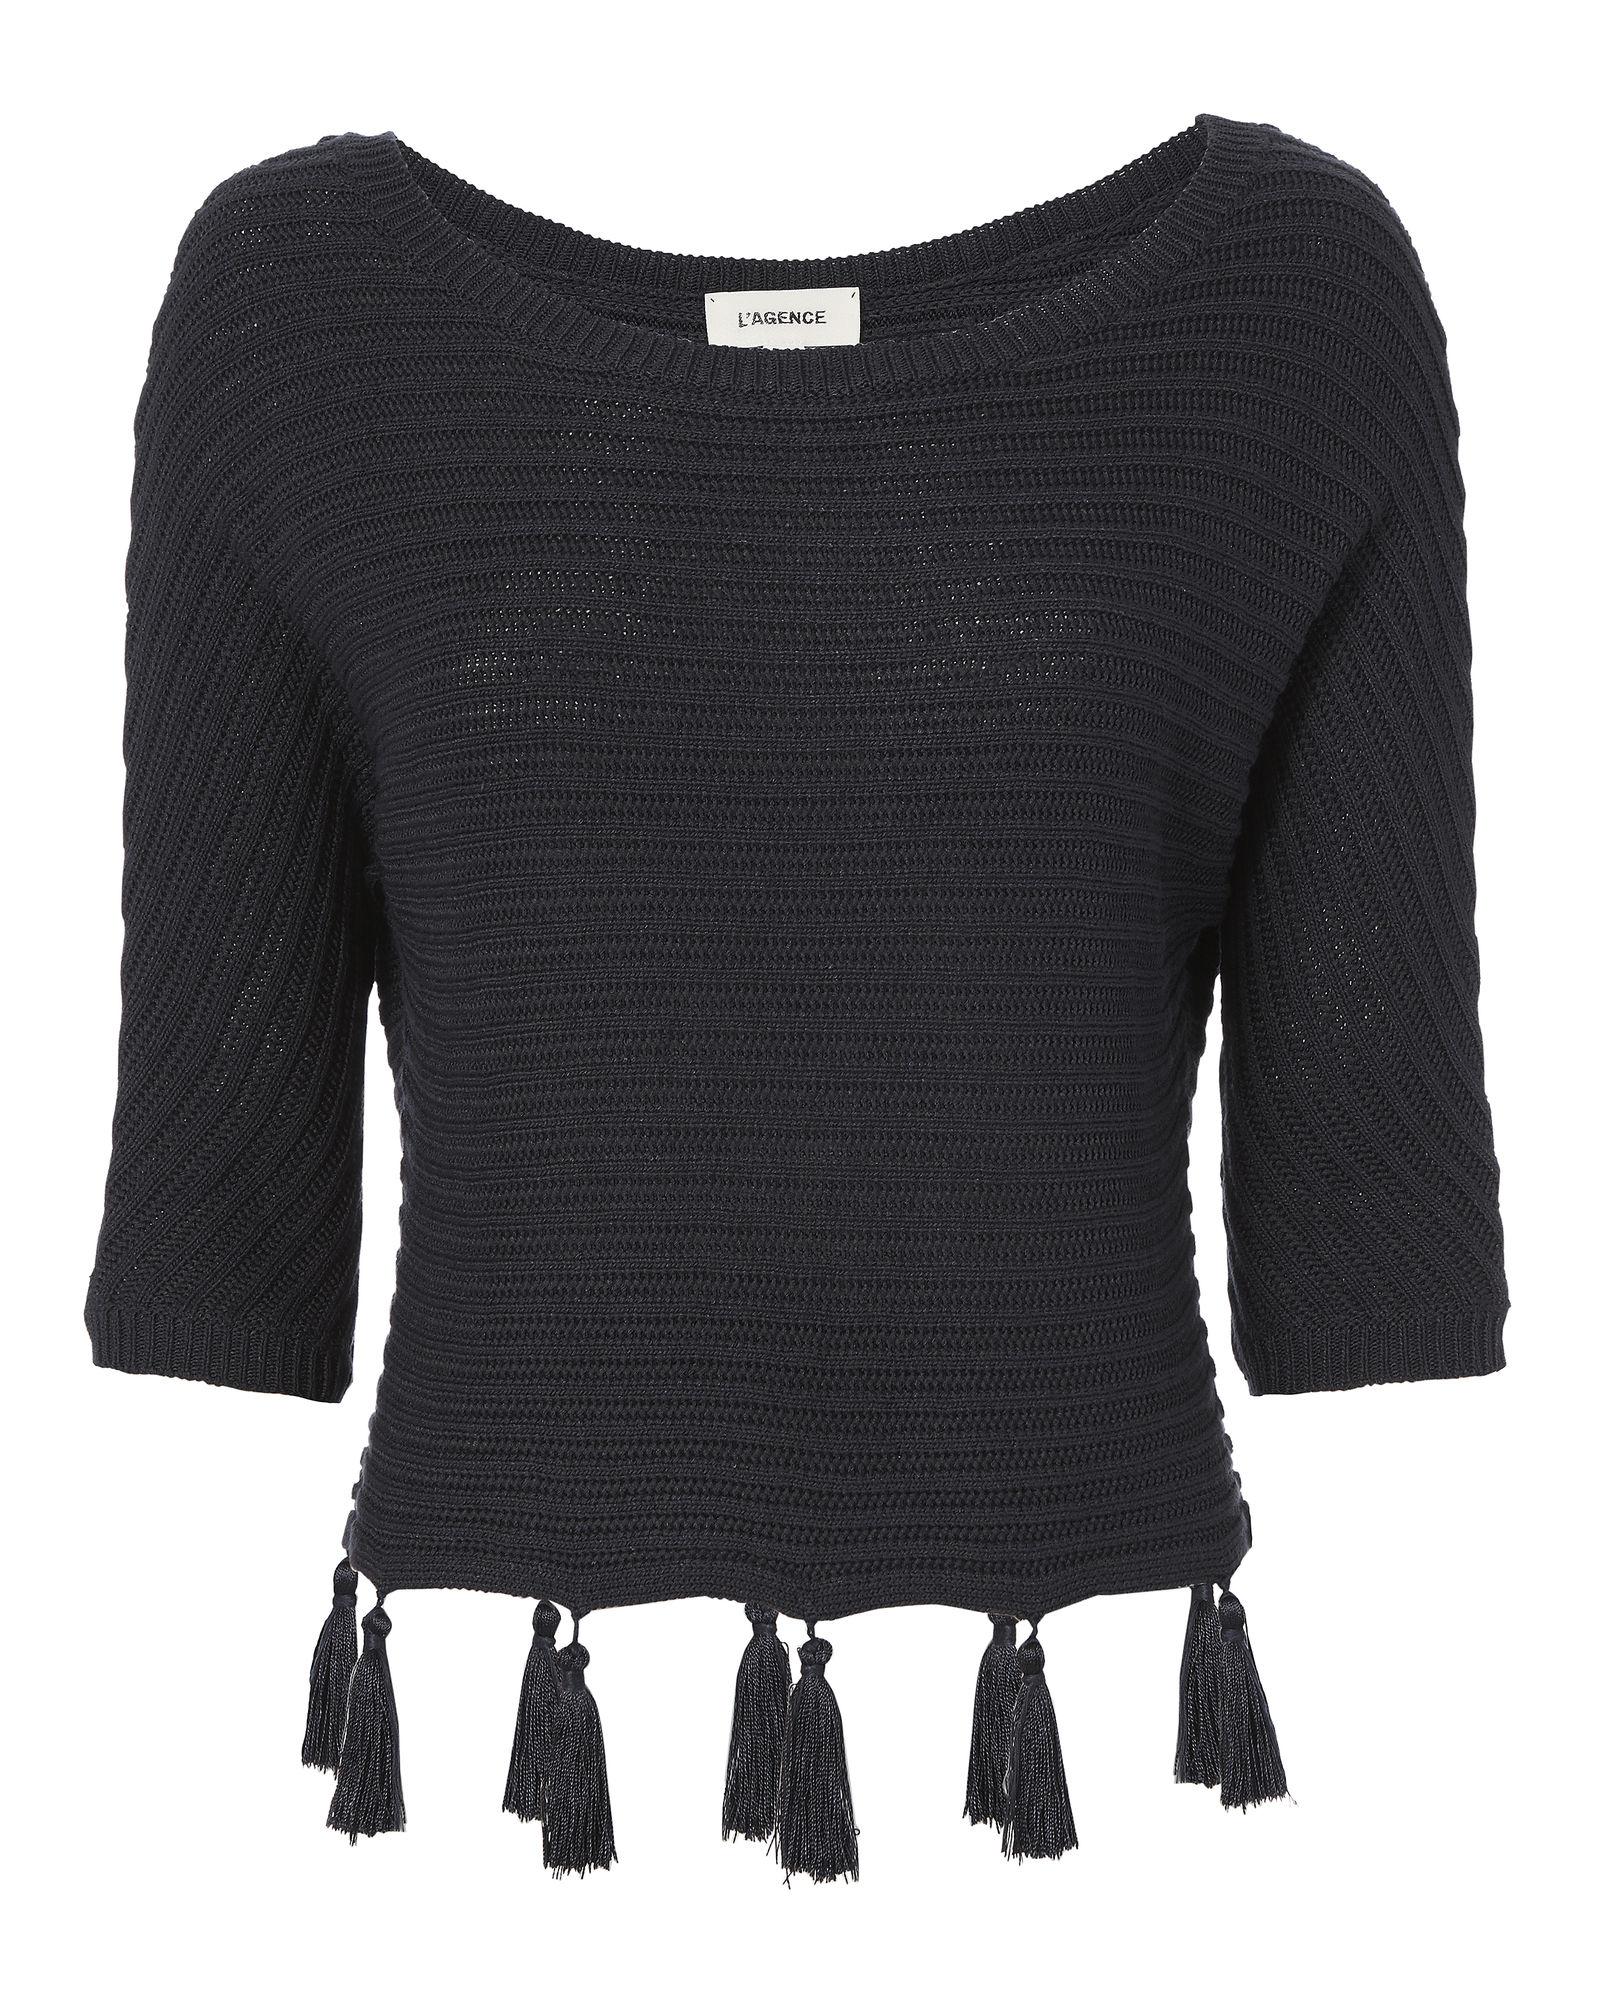 L Agence Alisia Tassel Detail Dolman Sweater